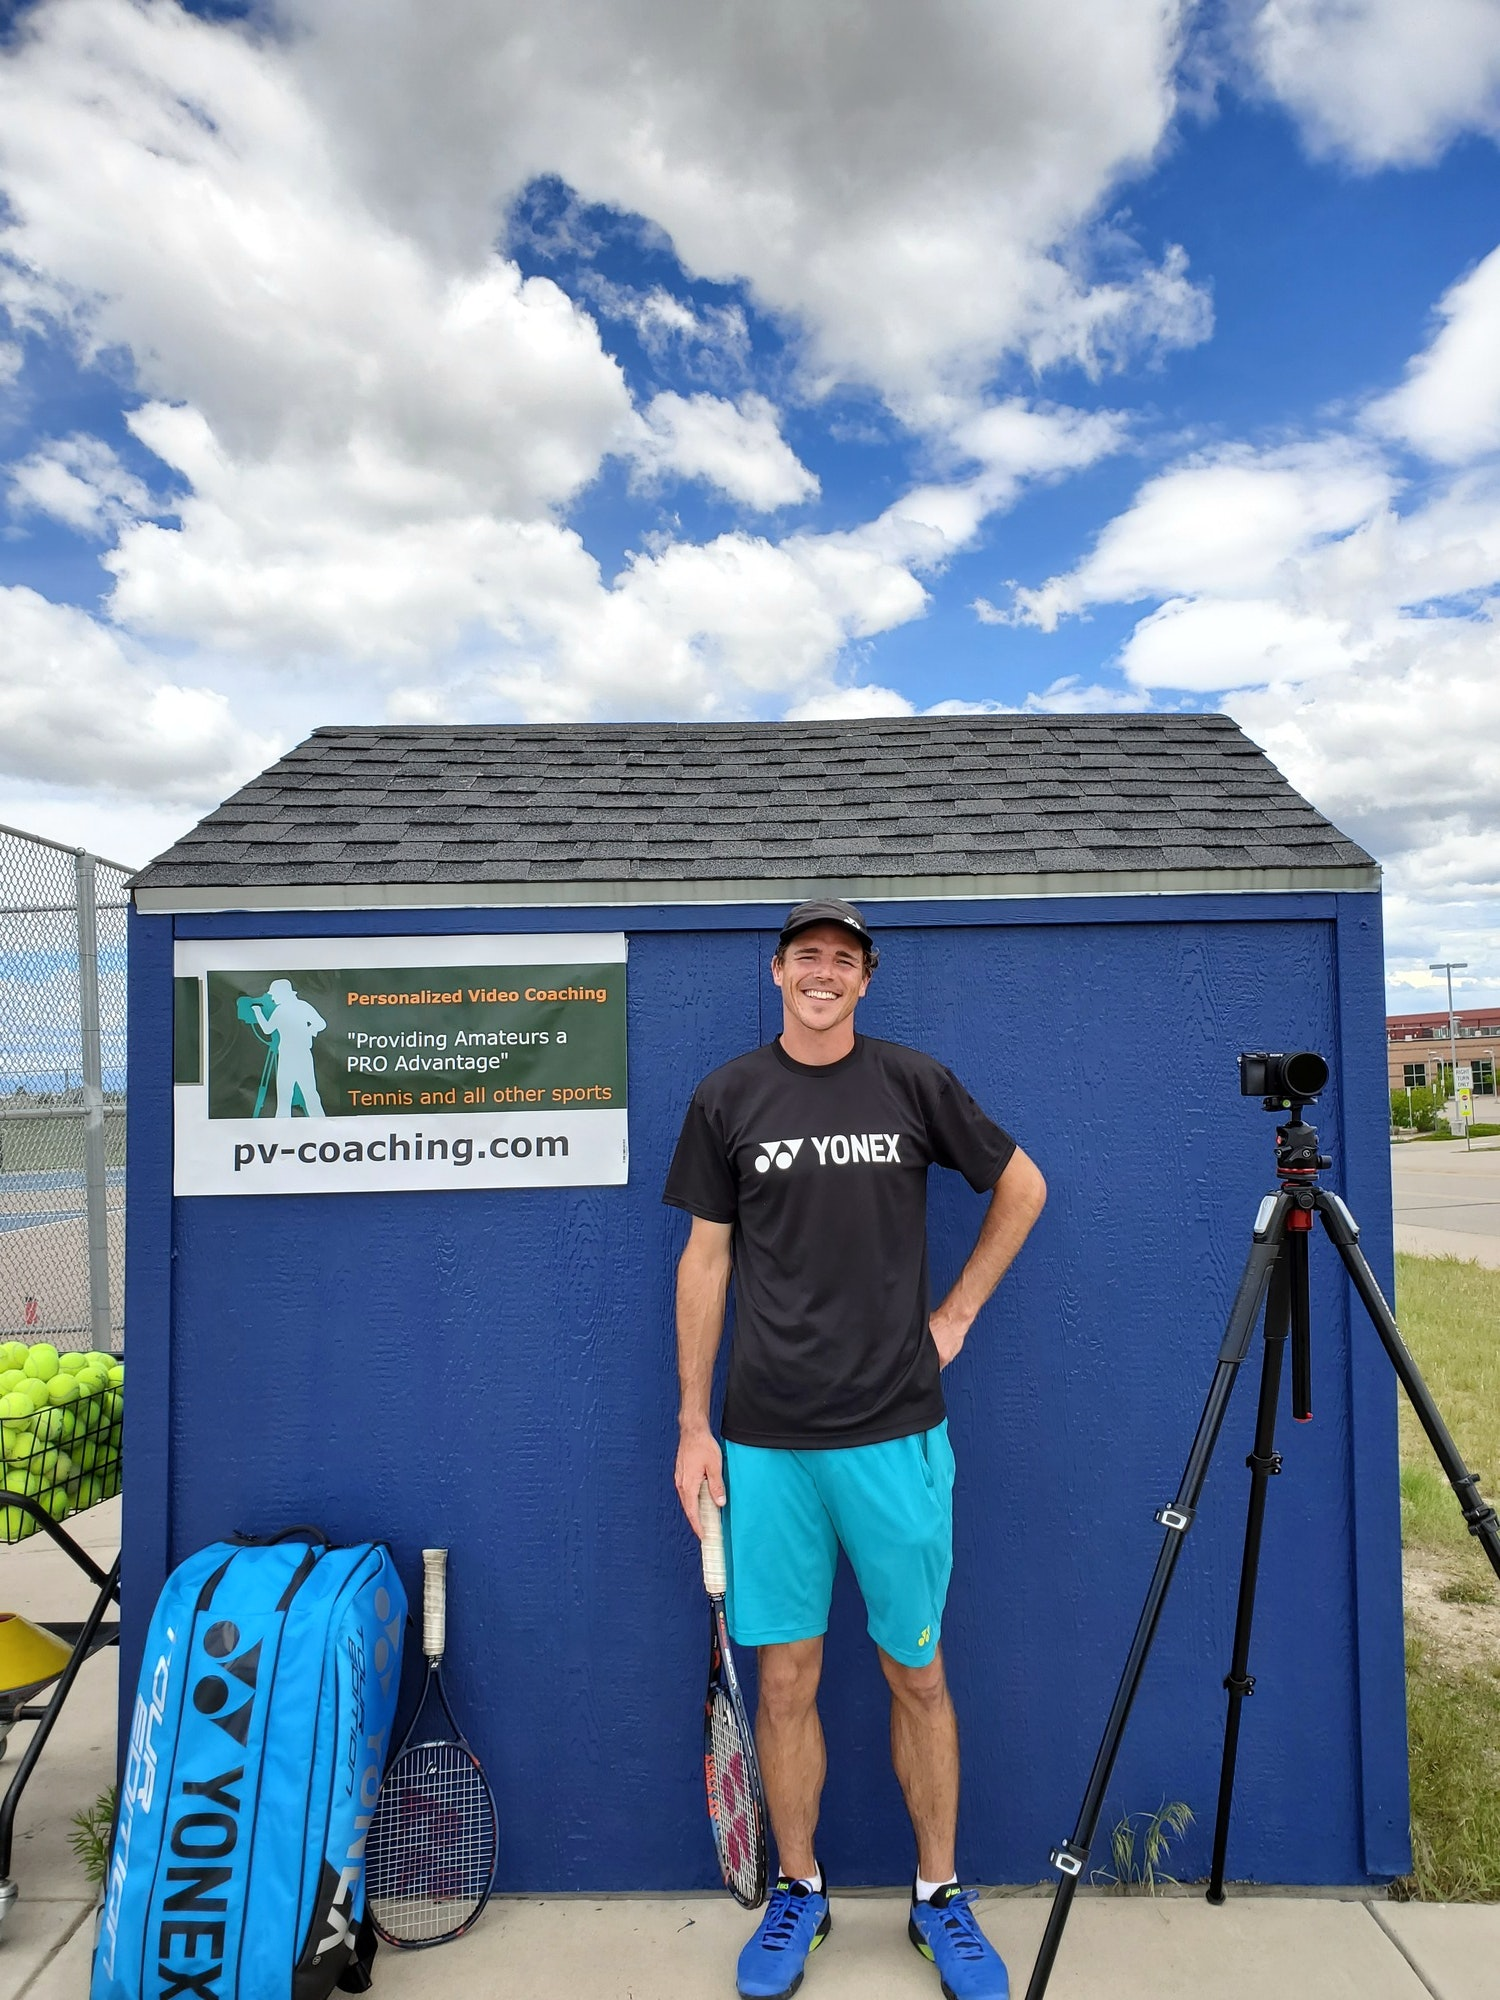 Casey G. teaches tennis lessons in Denver, CO